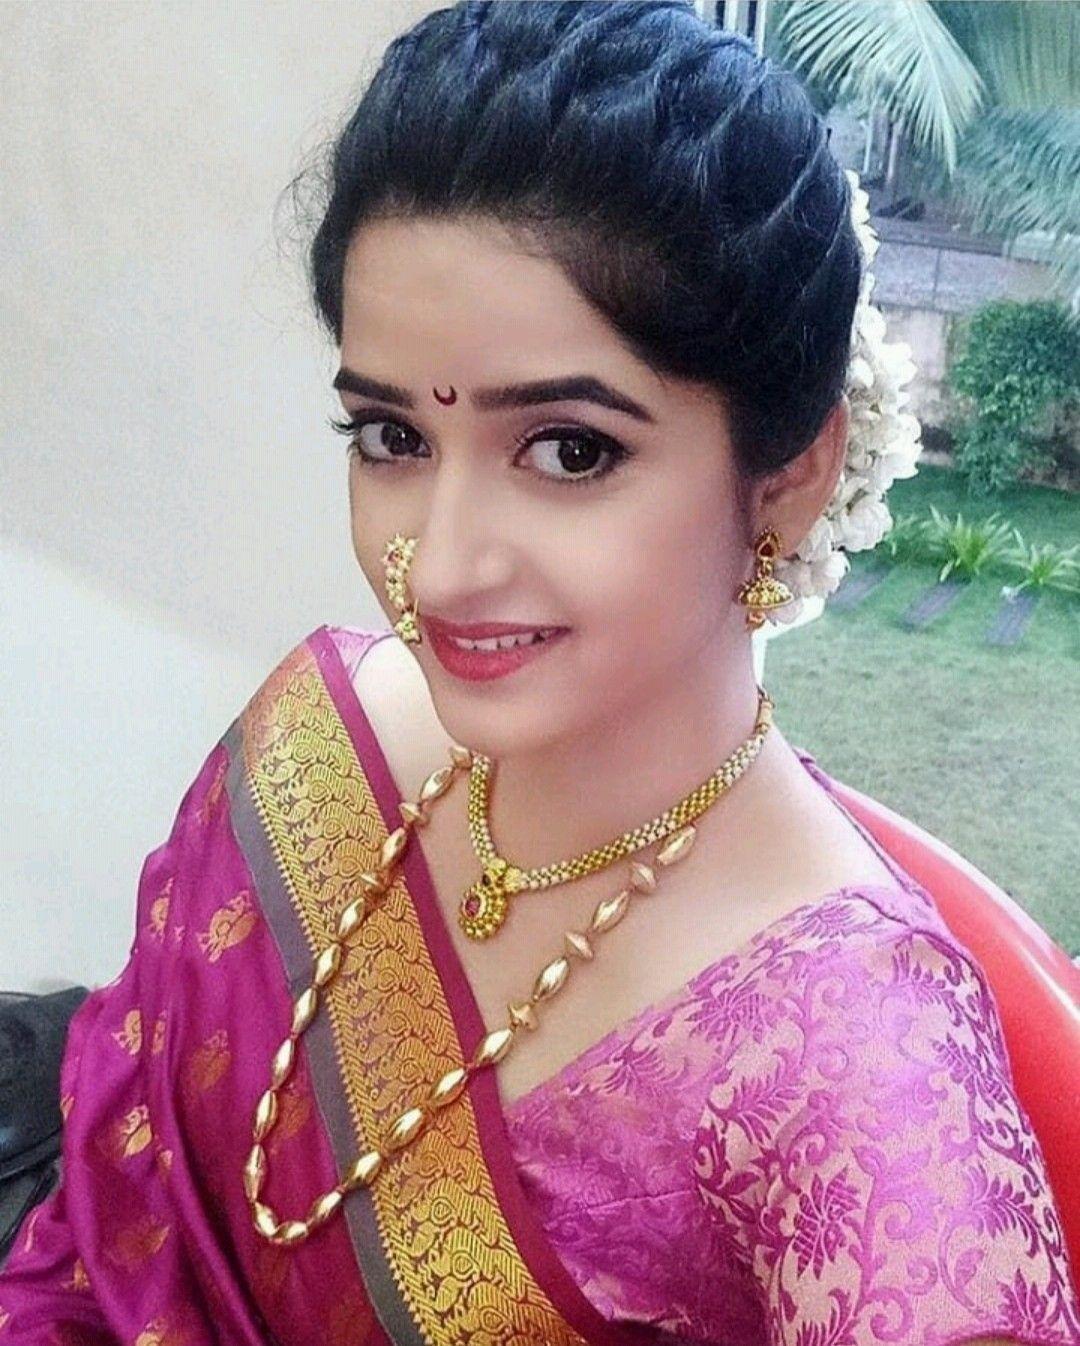 Pin By Amala Sivakumar On Dress In 2019 Indian Wedding